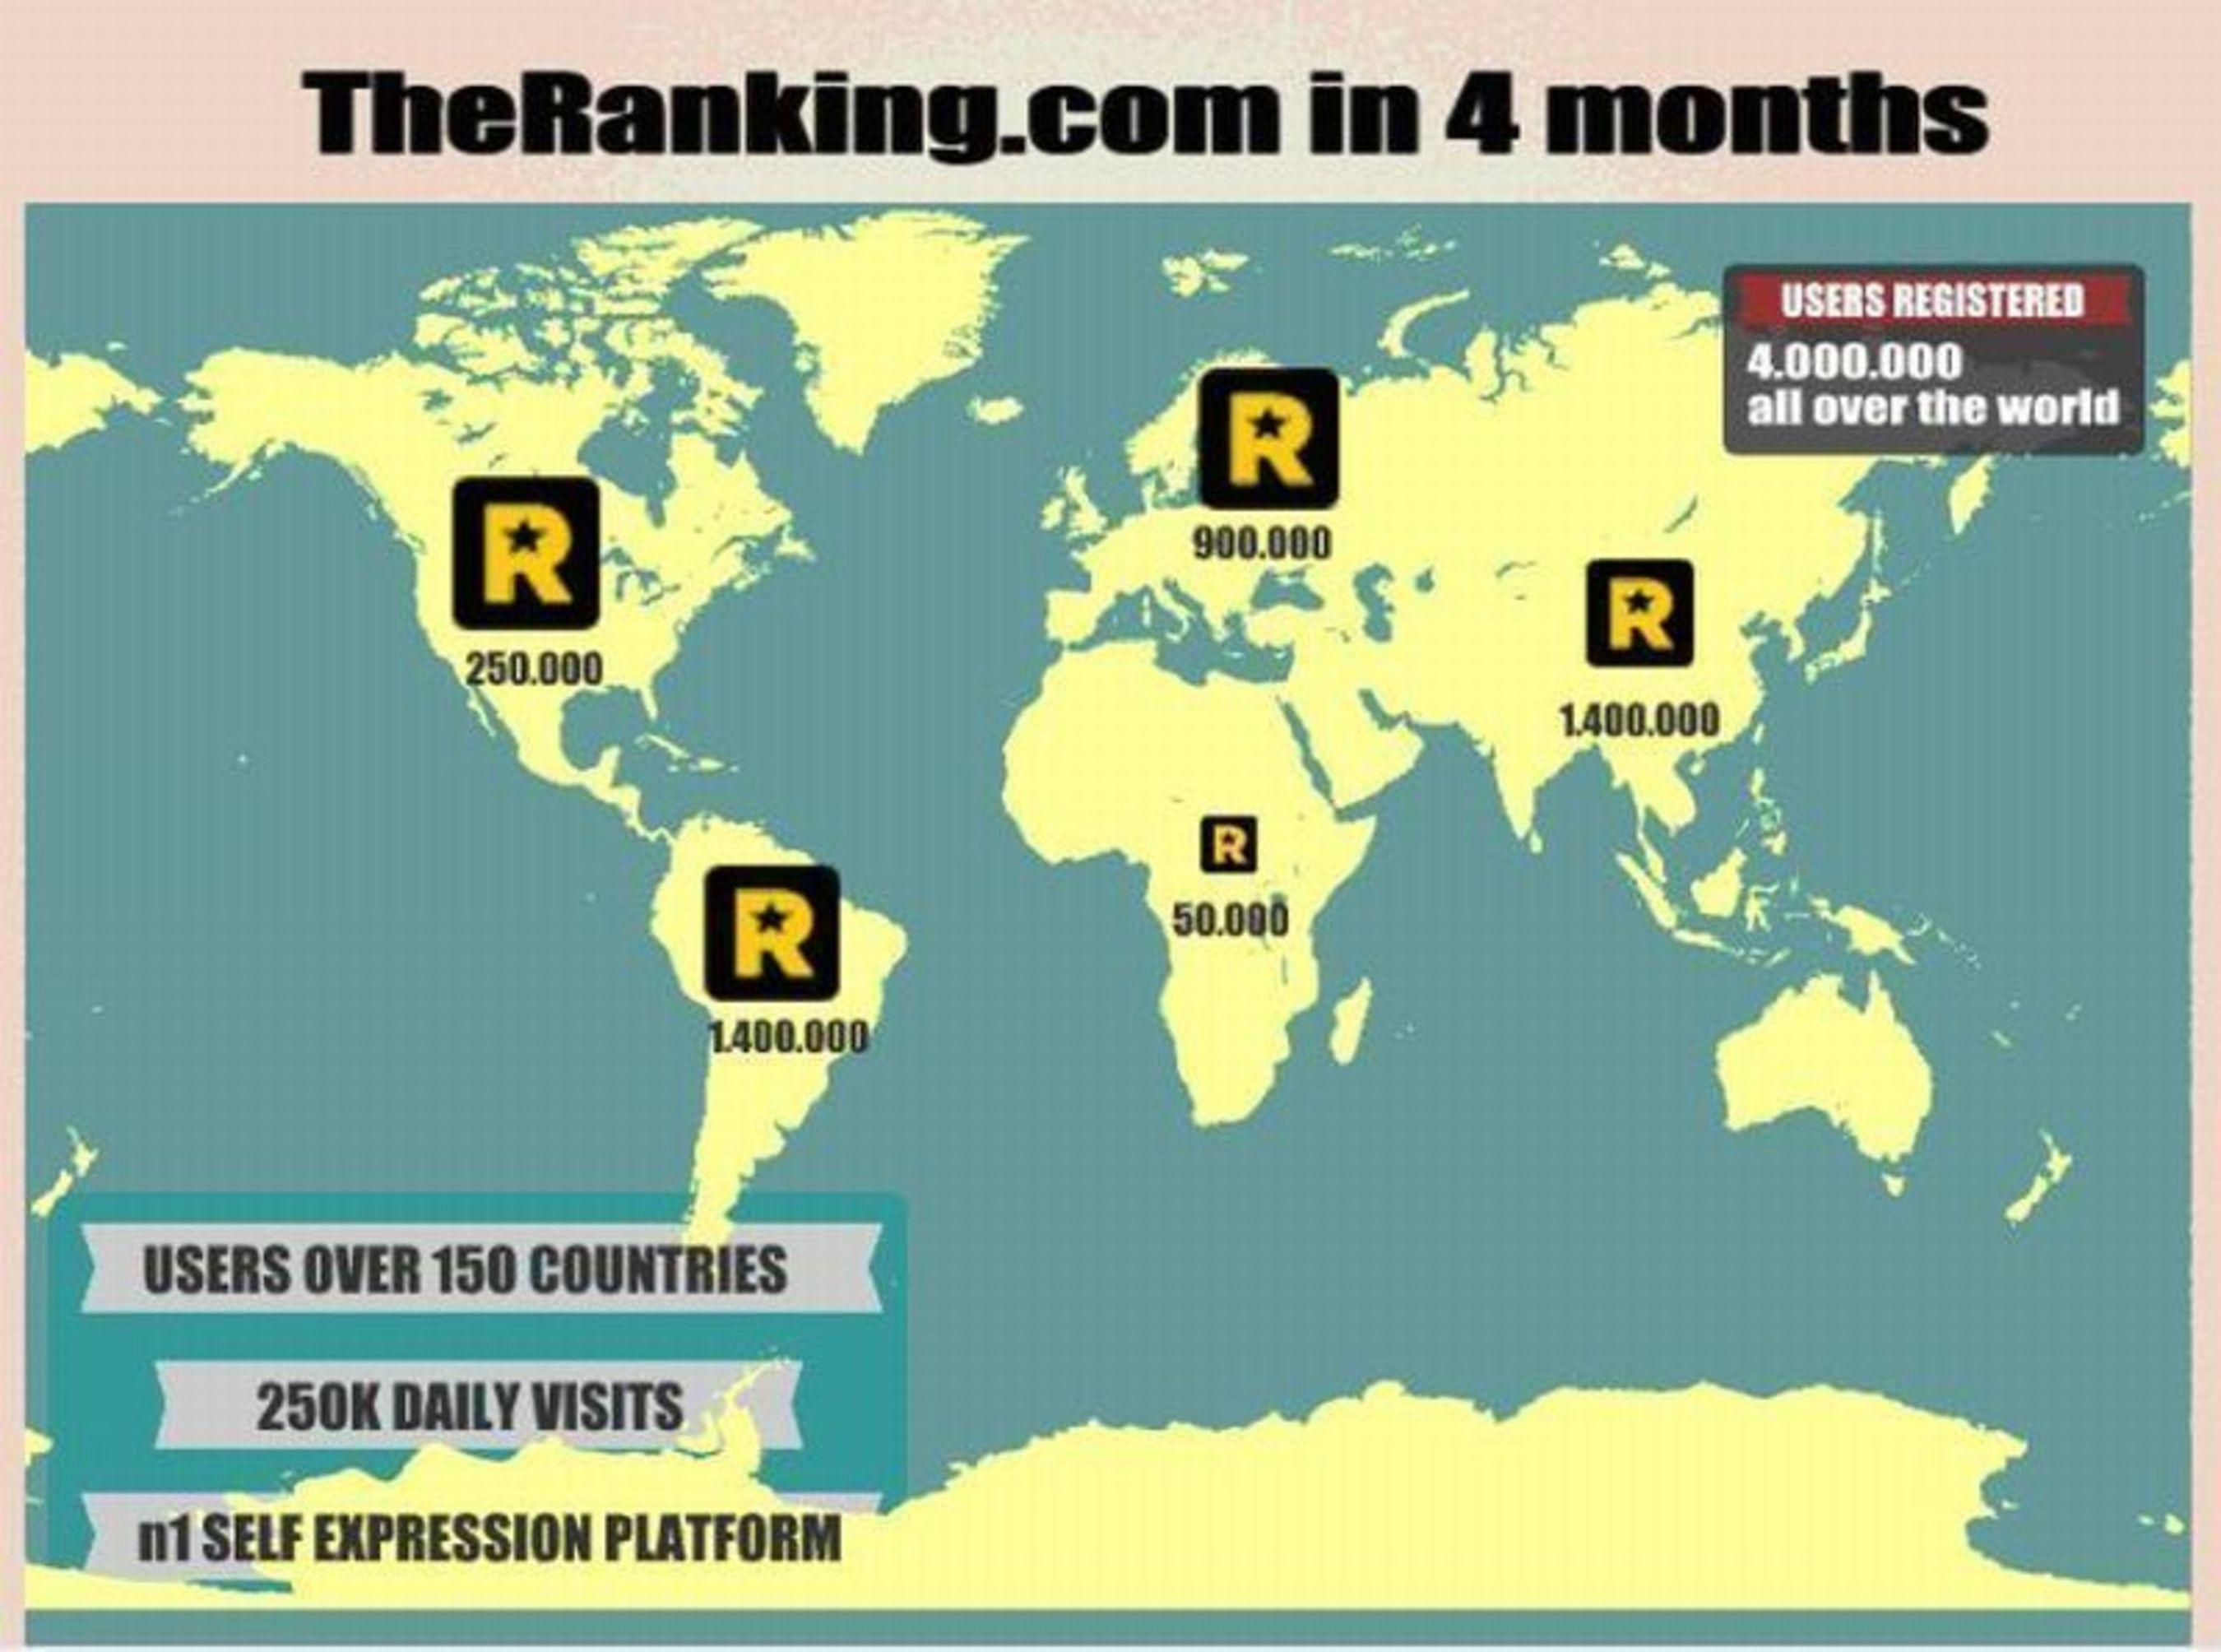 TheRanking.com in 4 months (PRNewsFoto/TheRanking.com)